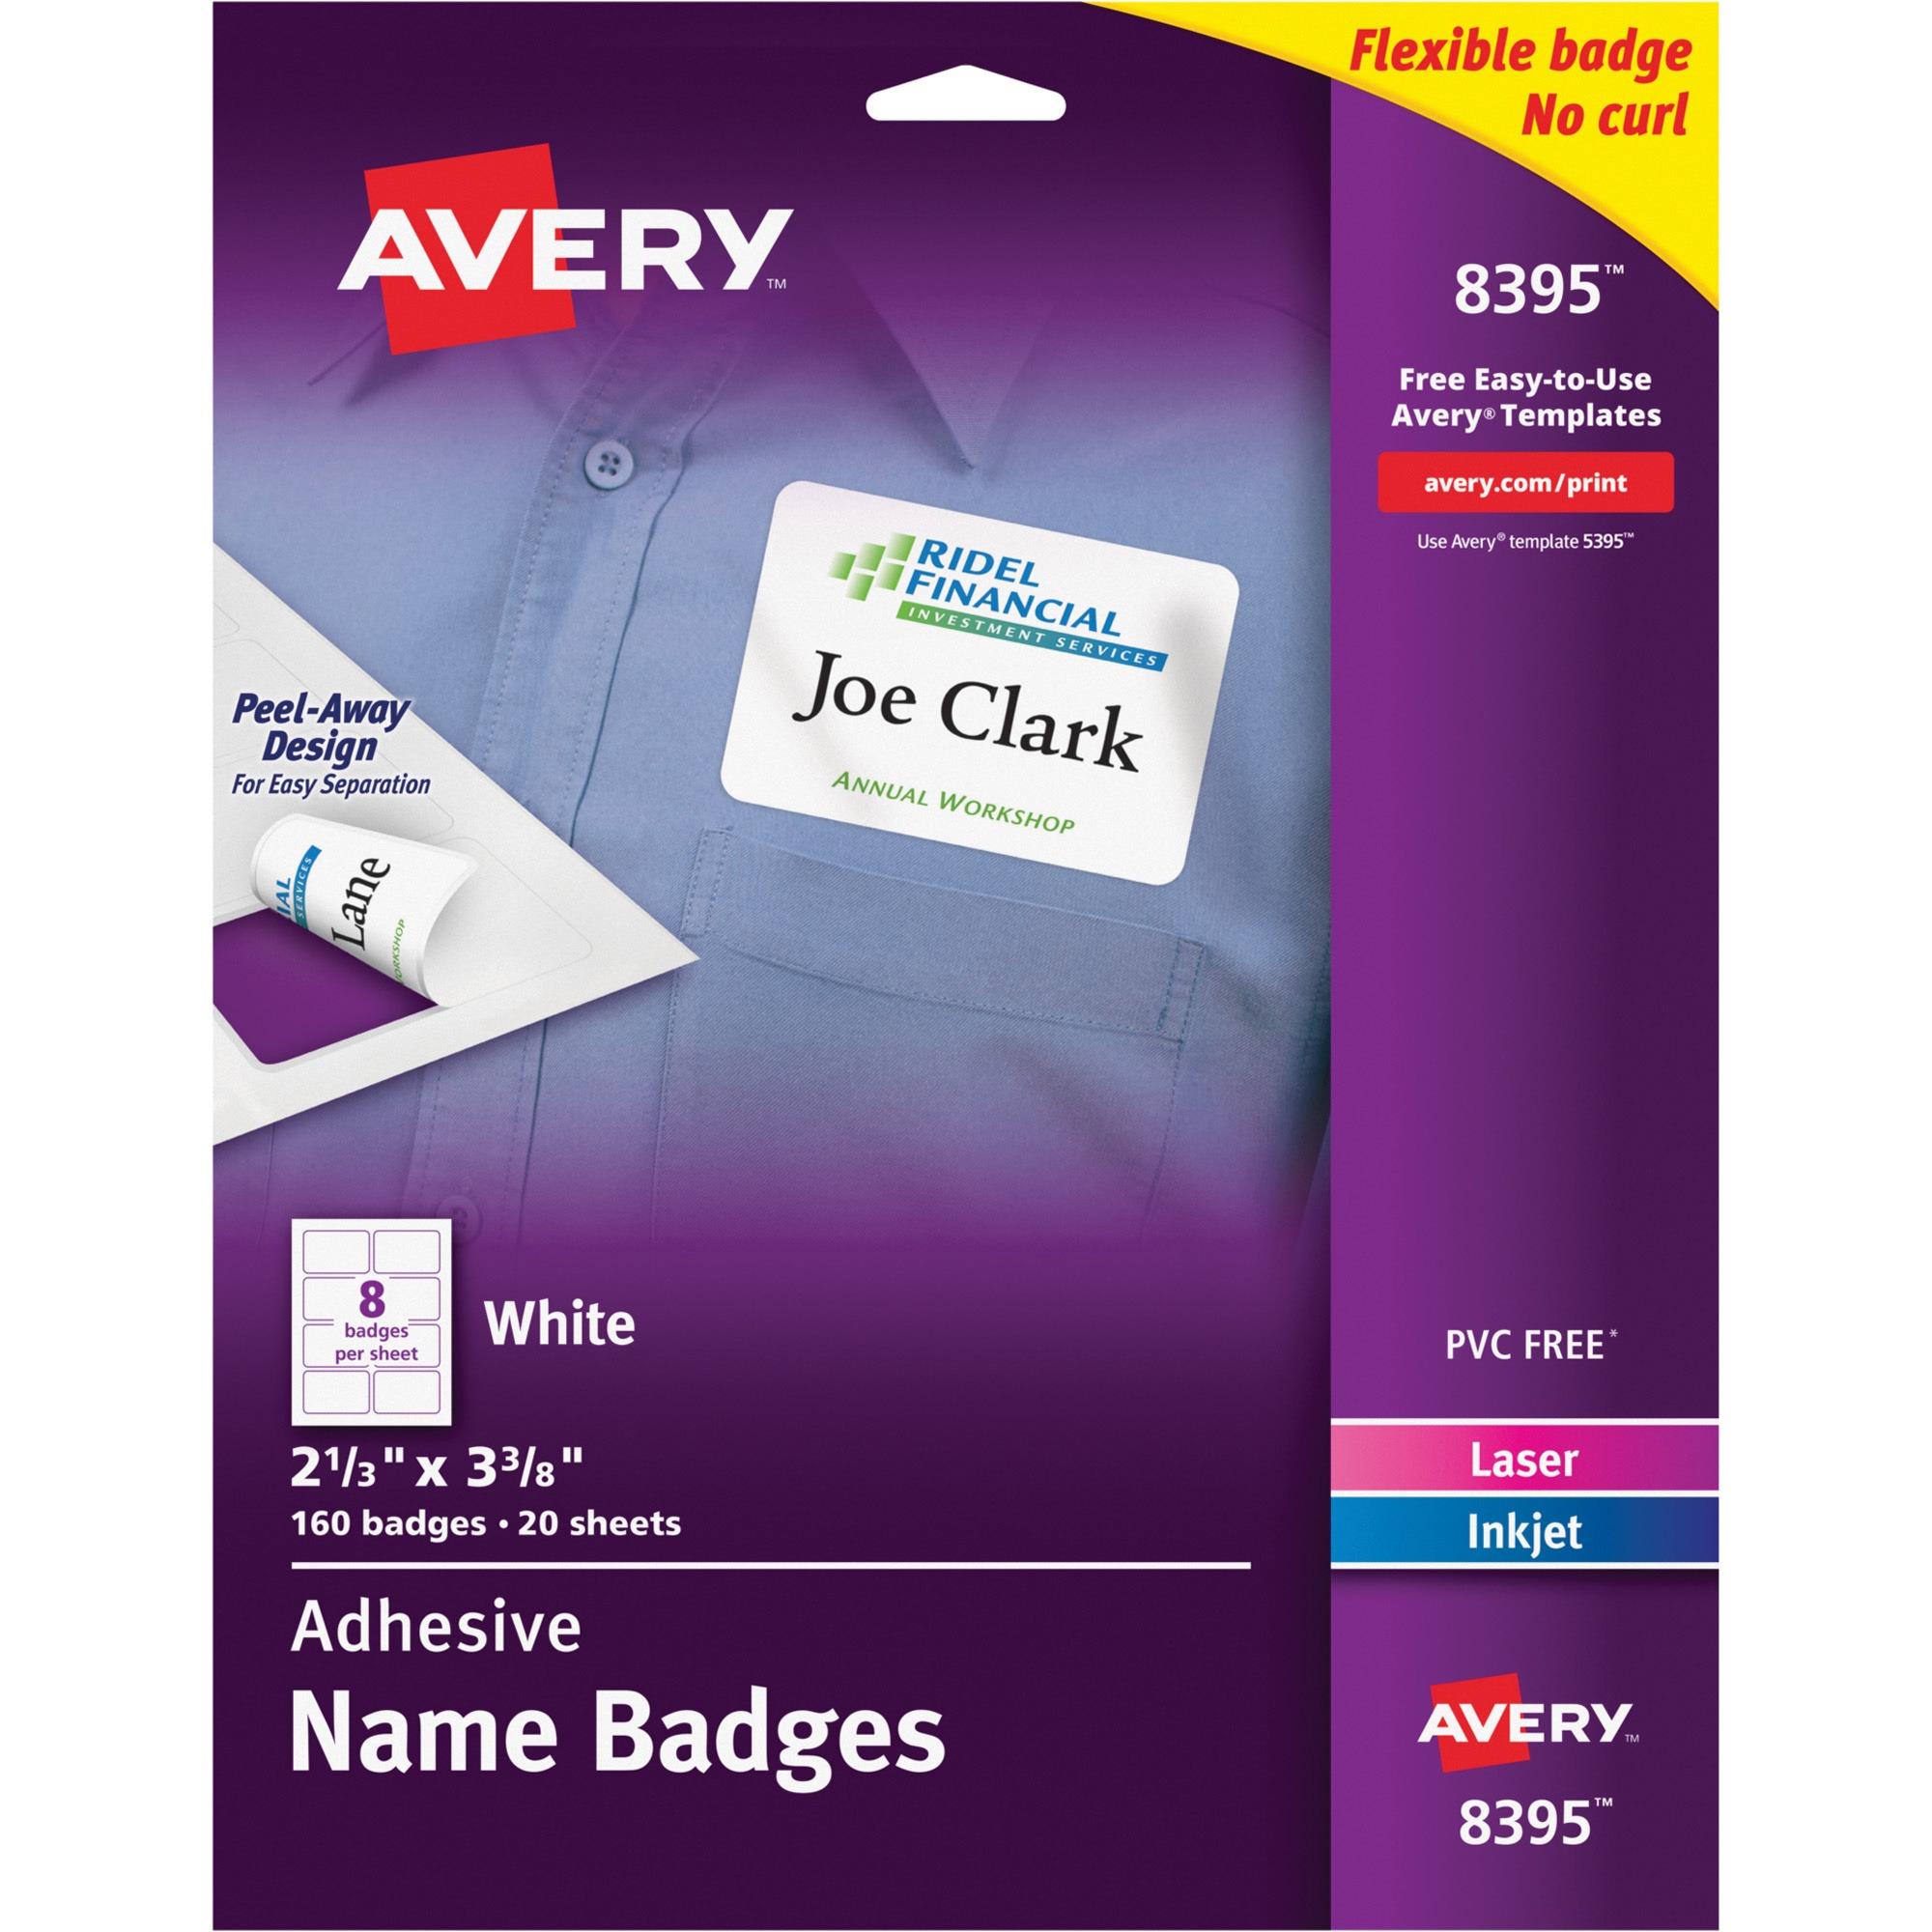 Avery Flexible Self-Adhesive Laser/Inkjet Name Badge Labels, 2 1/3 x 3 3/8, WE, 160/PK